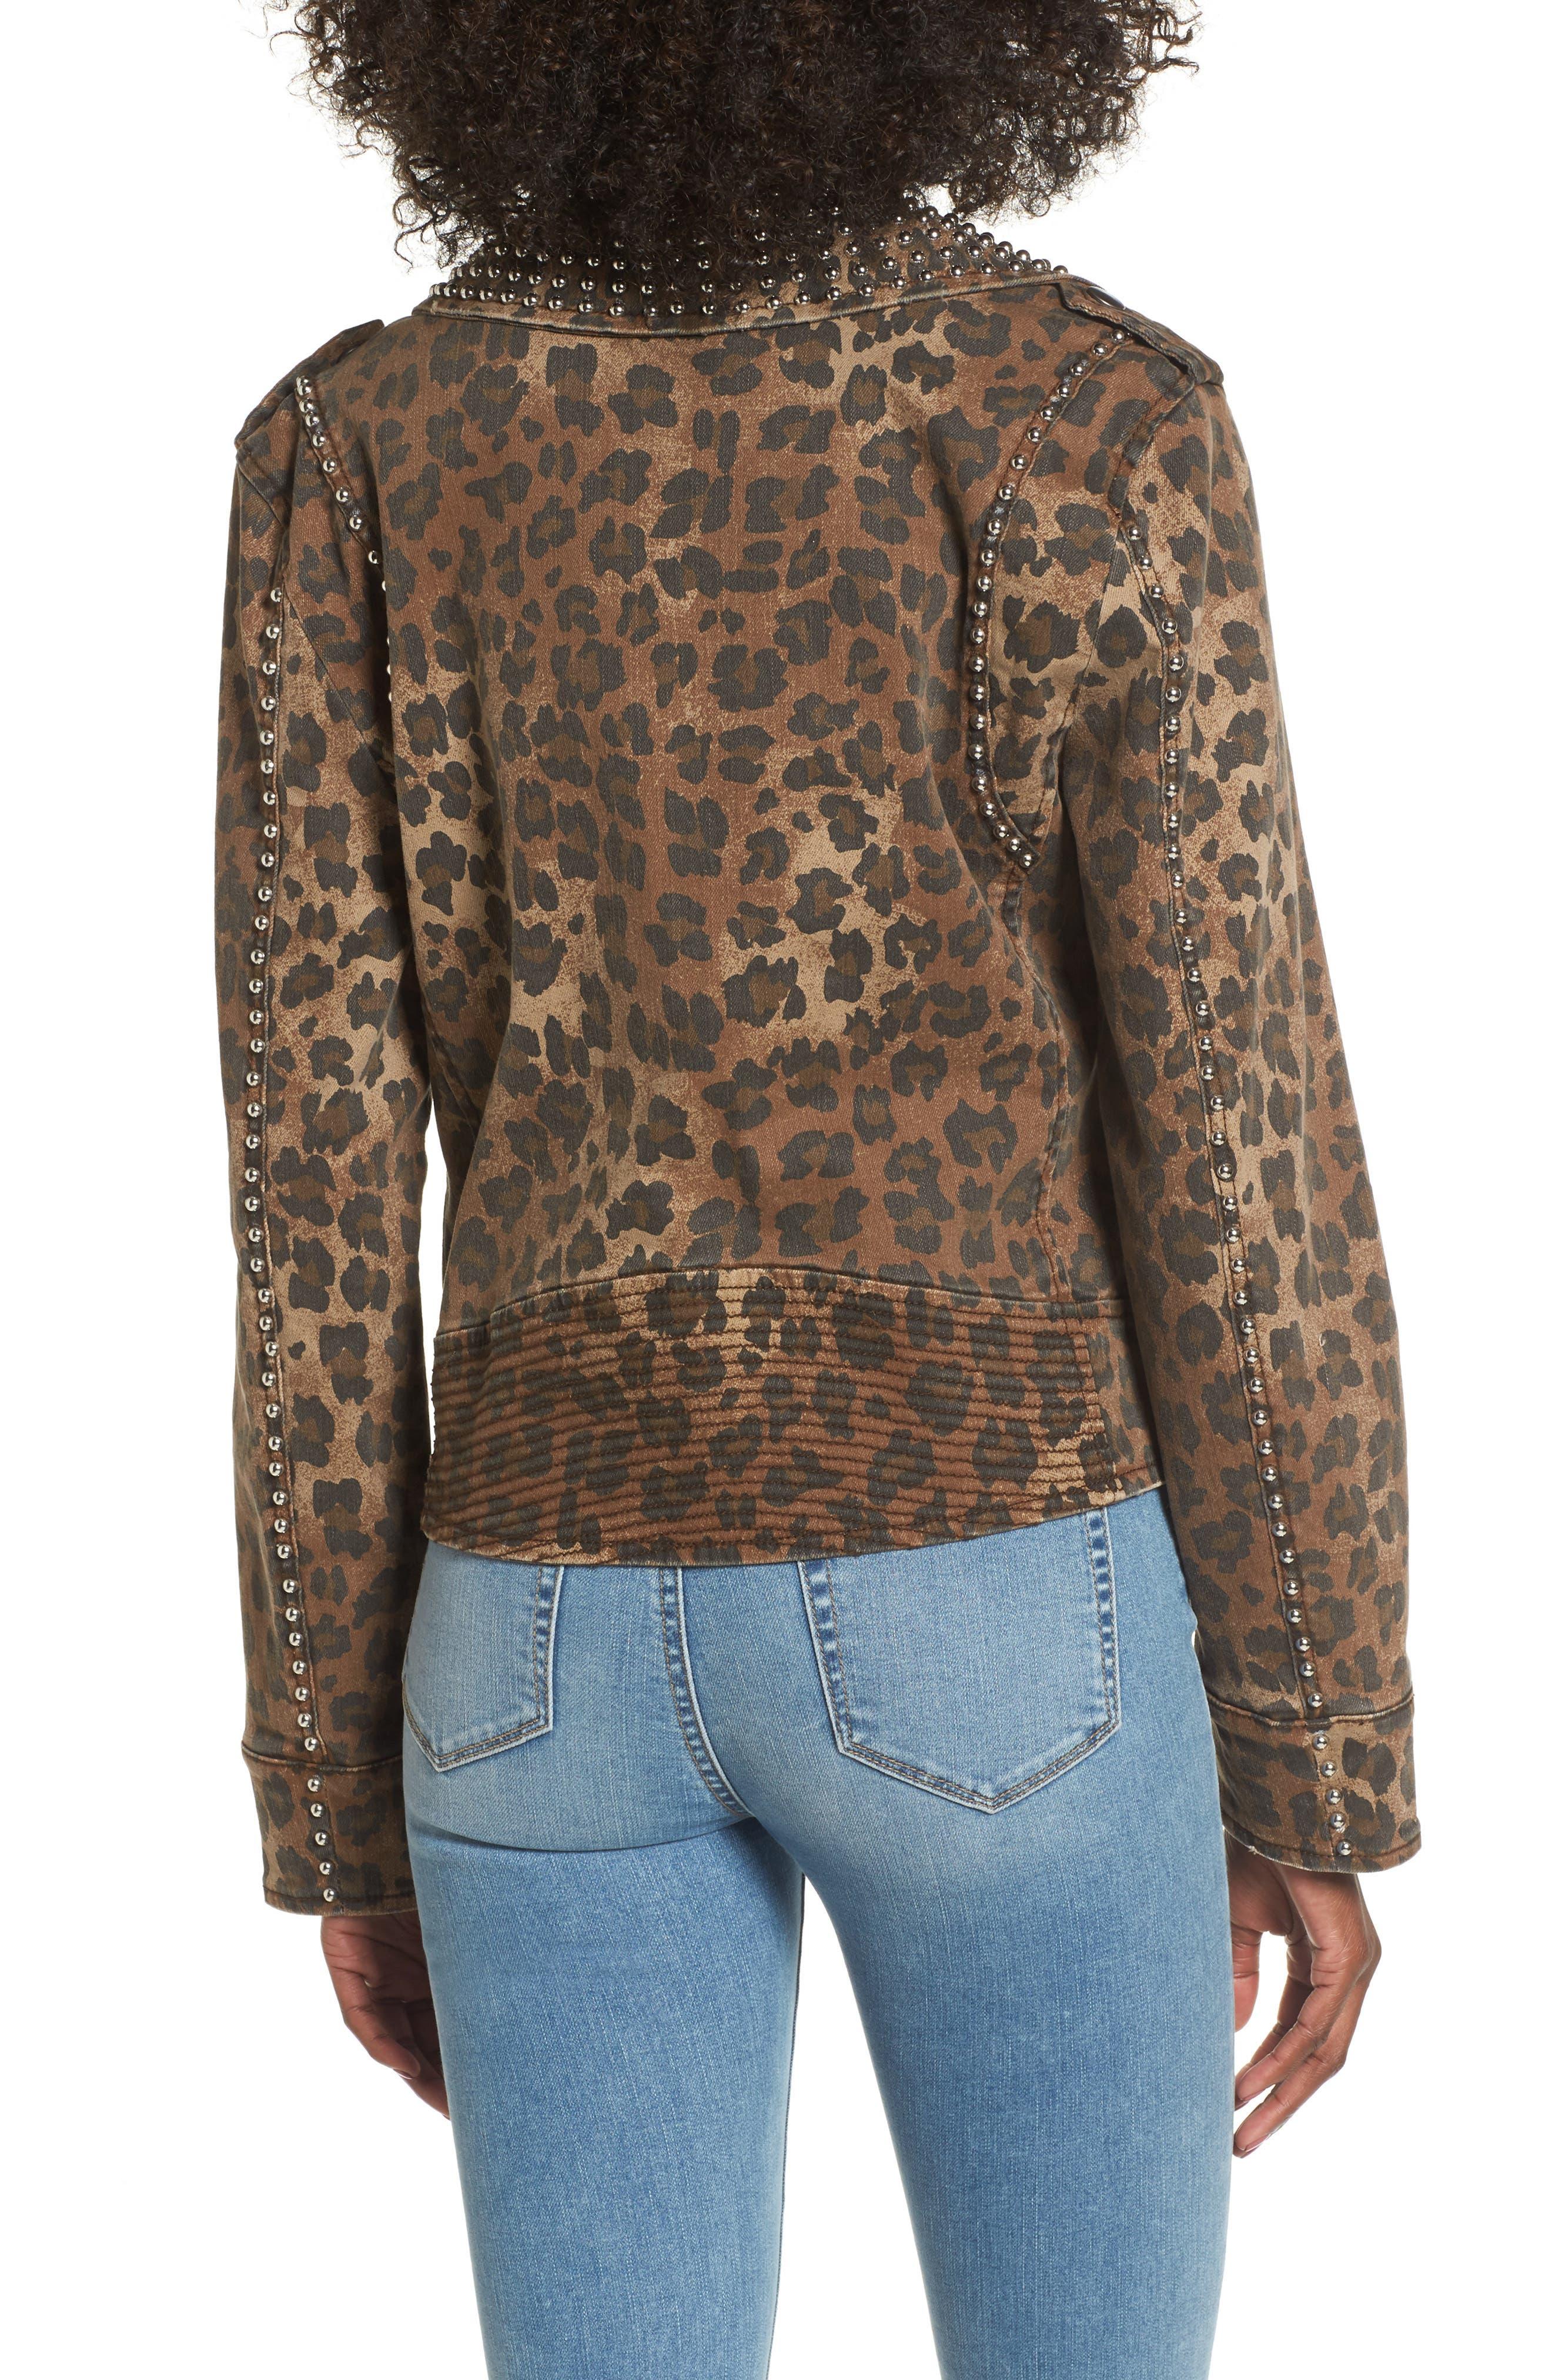 AFRM Studded Leopard Print Moto Jacket,                             Alternate thumbnail 3, color,